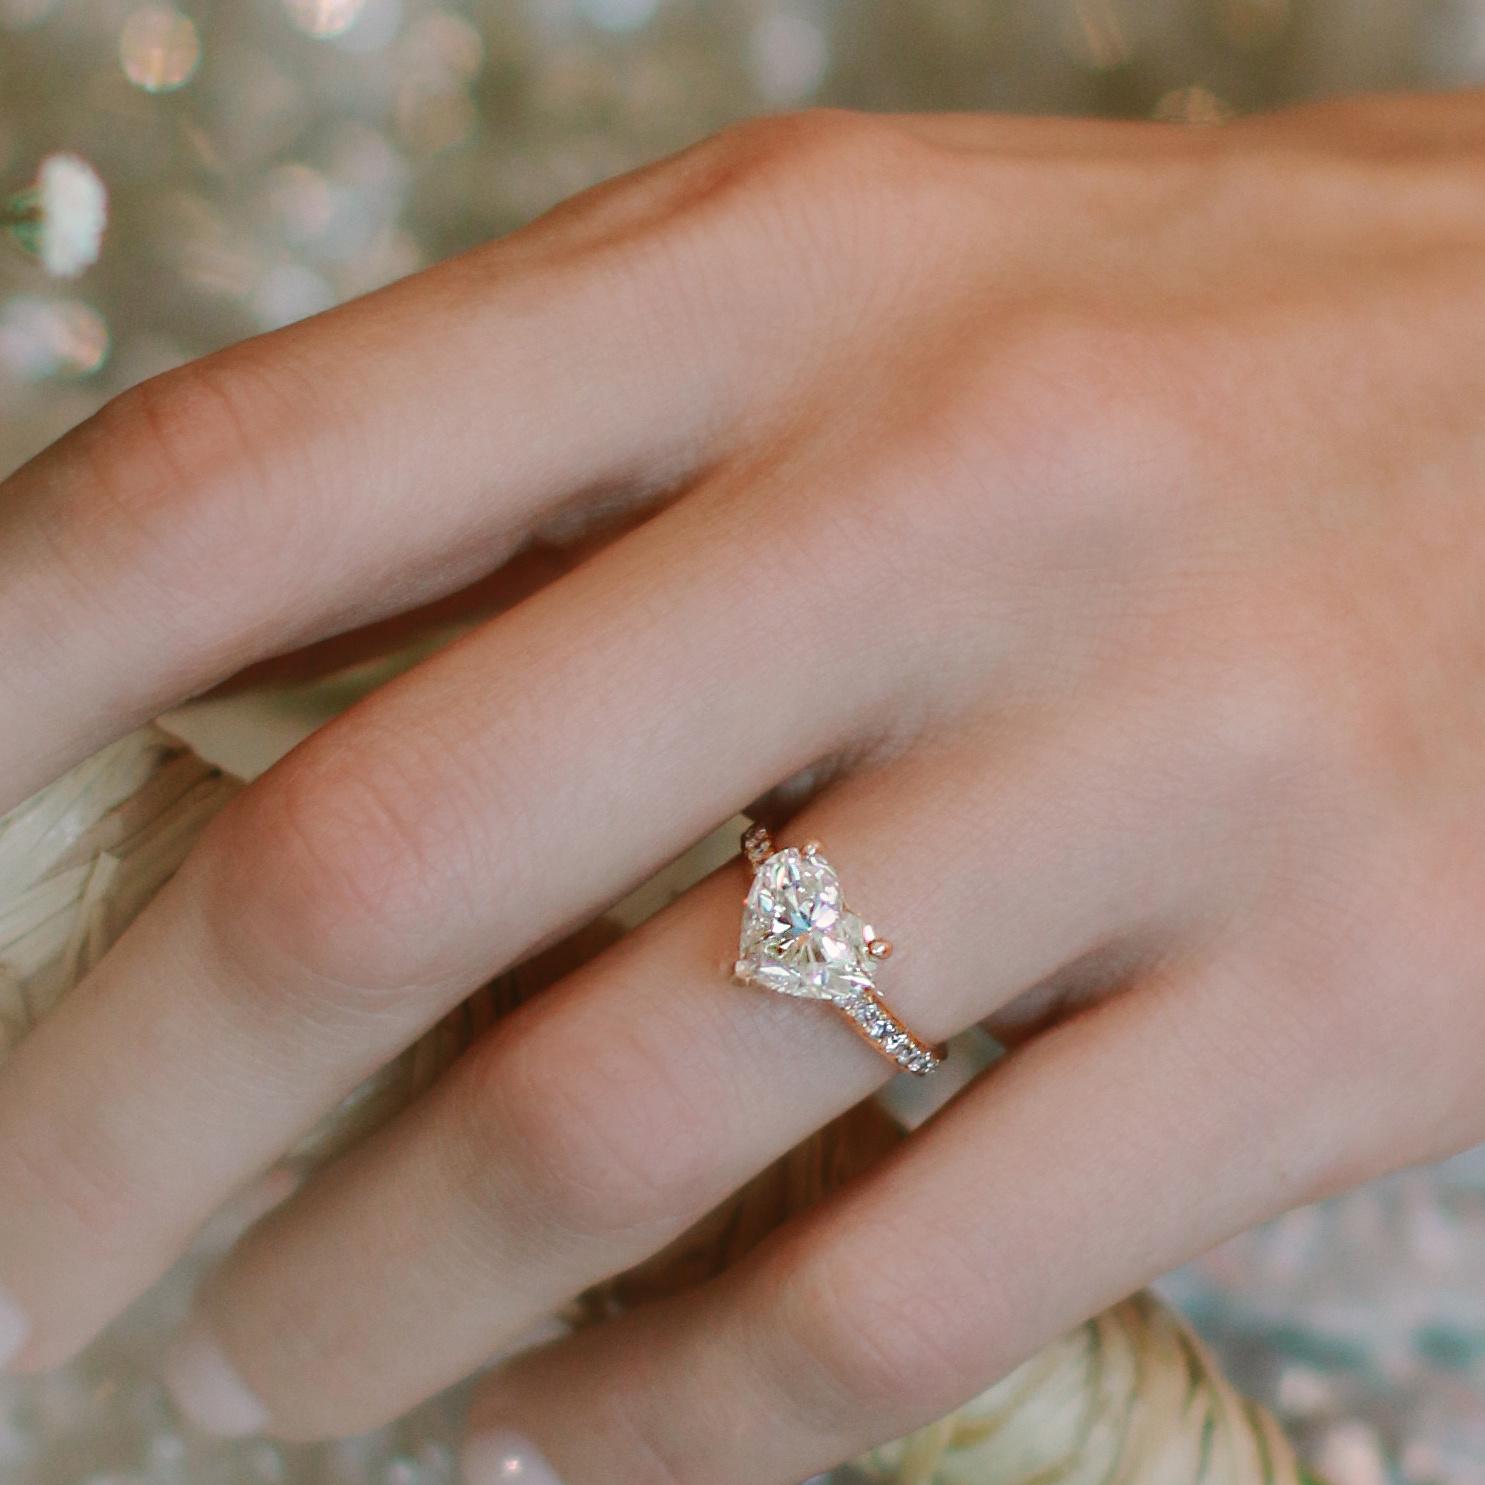 Bespoke Bridal Rings